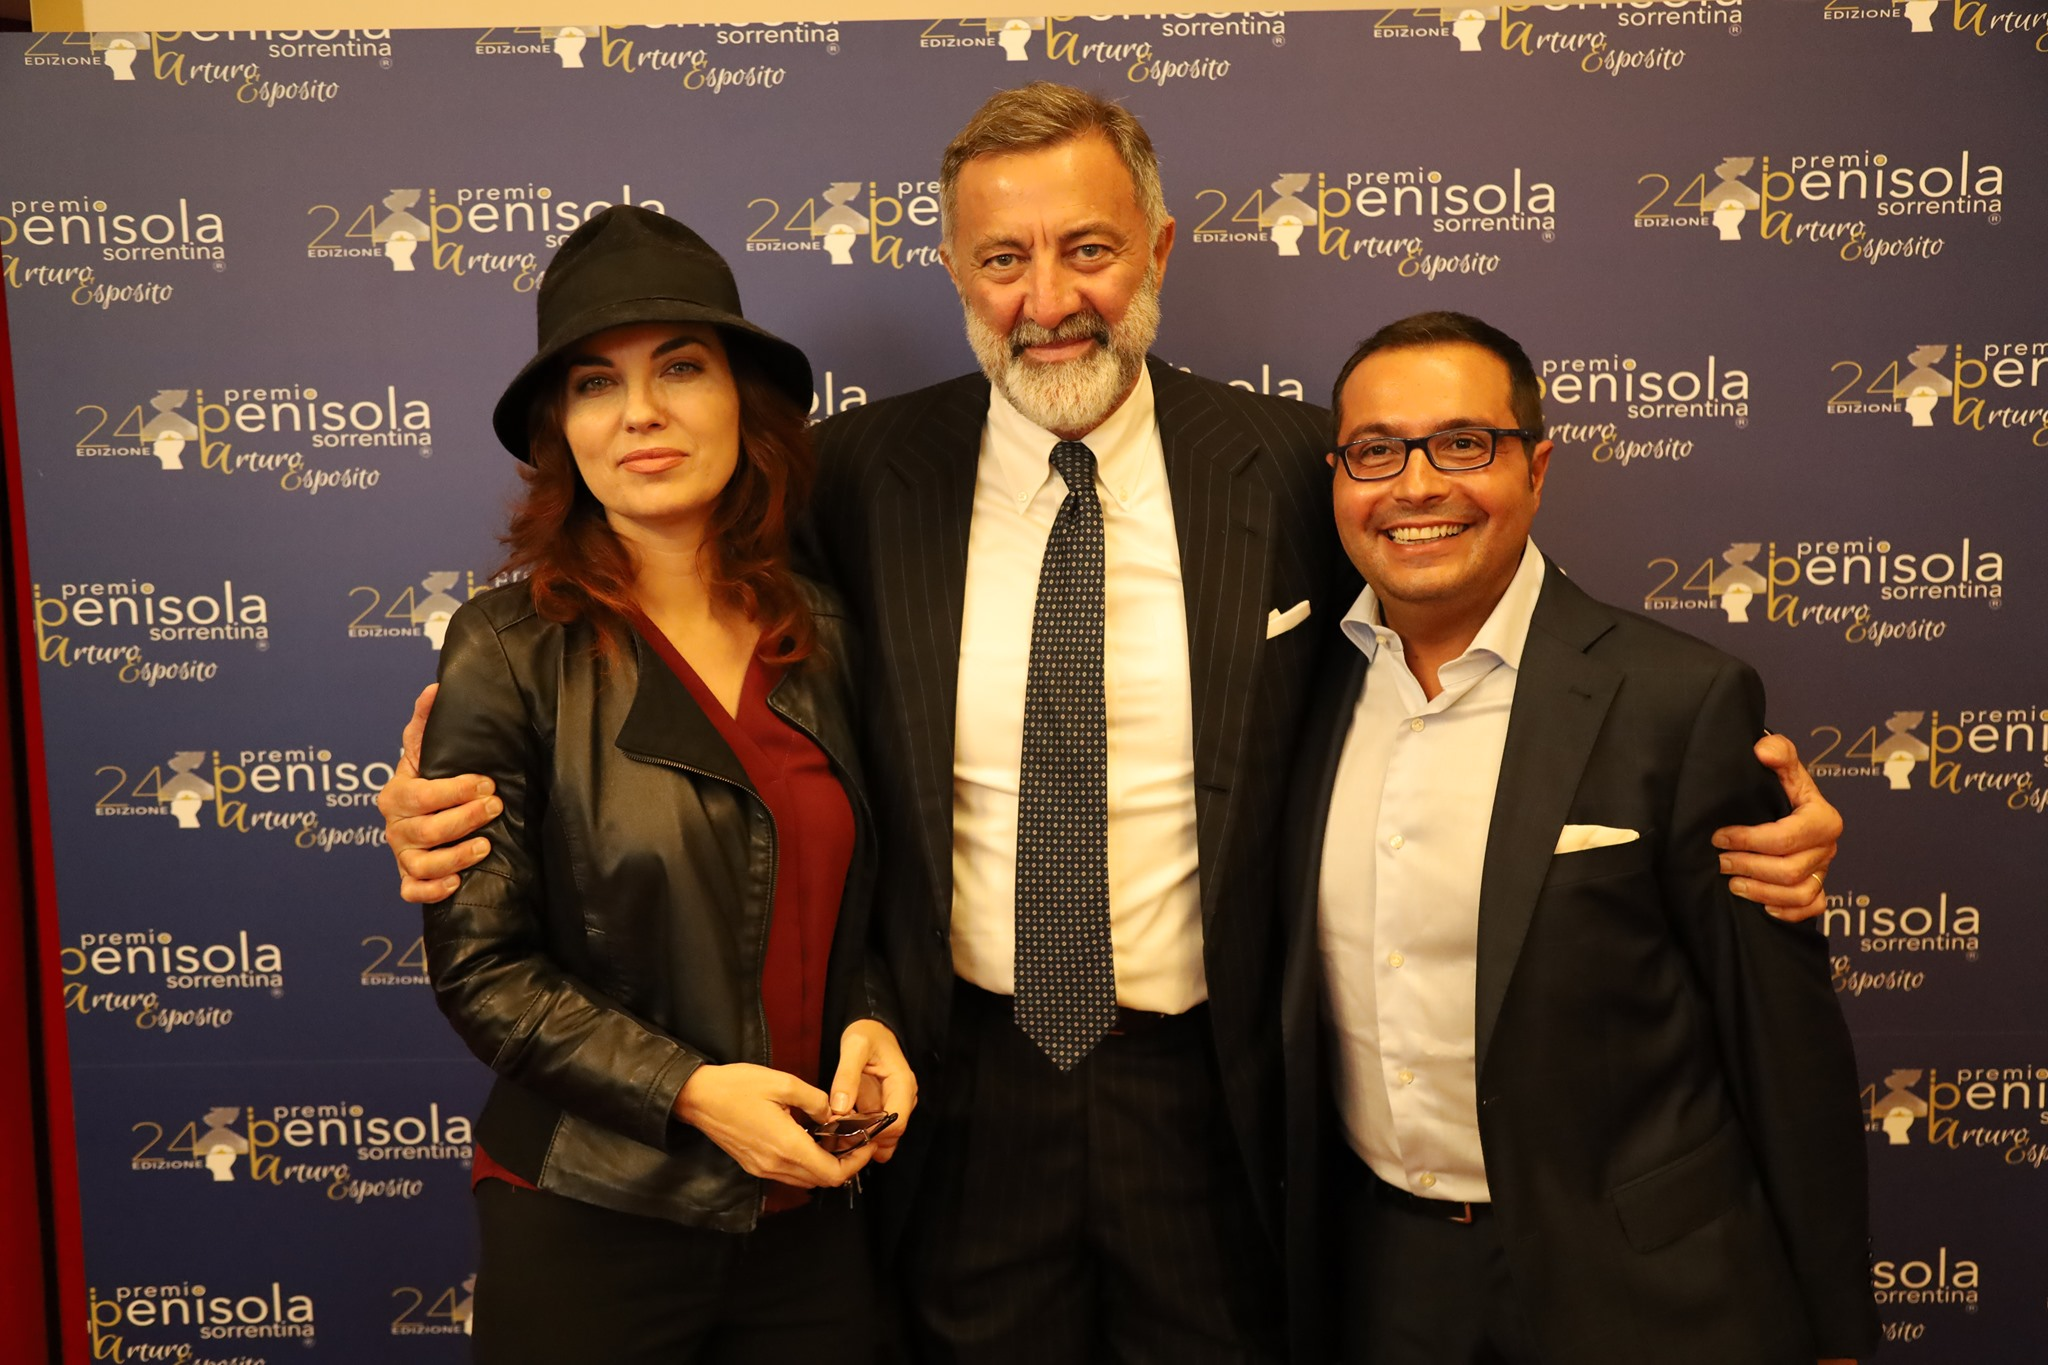 Premio Penisola Sorrentina 2019